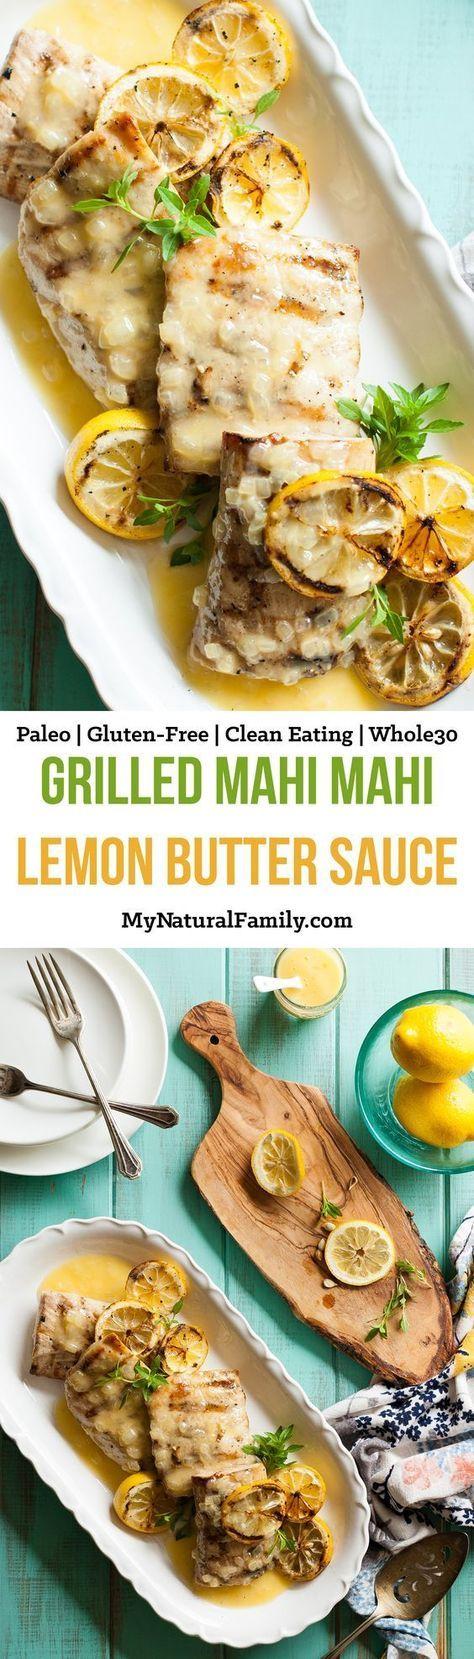 grilled mahi mahi recipe in a lemon butter sauce  recipe